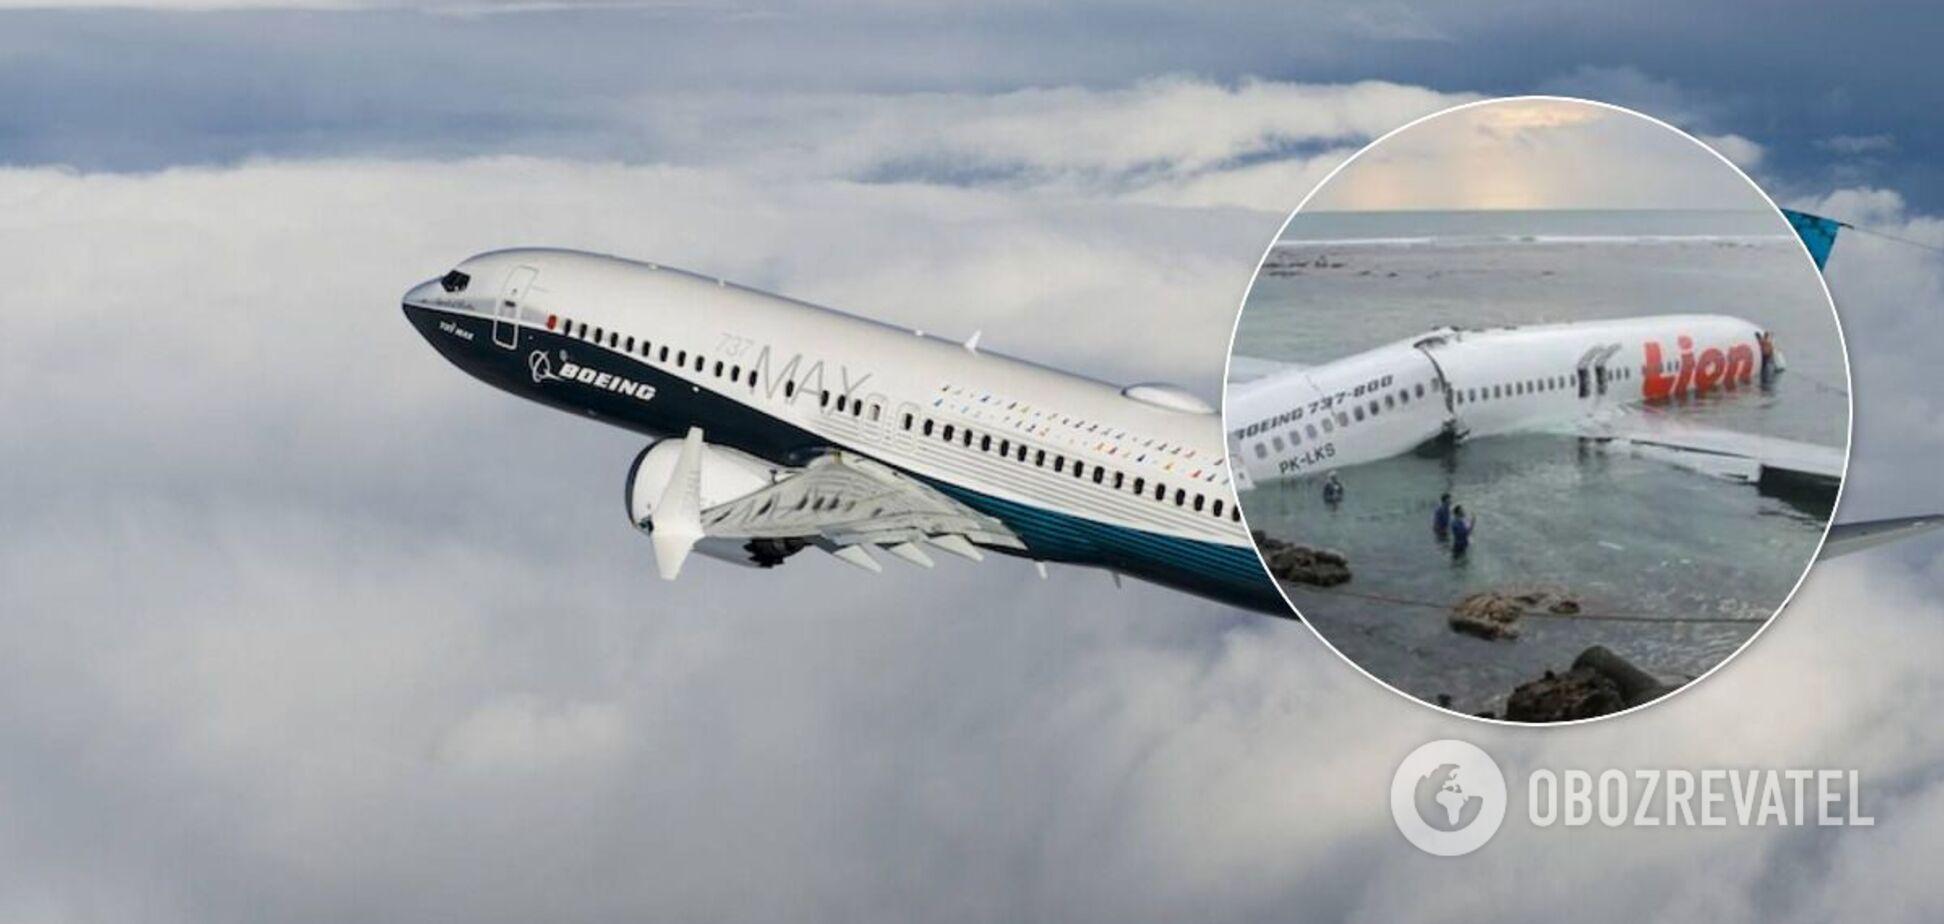 Эксплуатация Boeing 737 MАХ была прекращена после двух катастроф